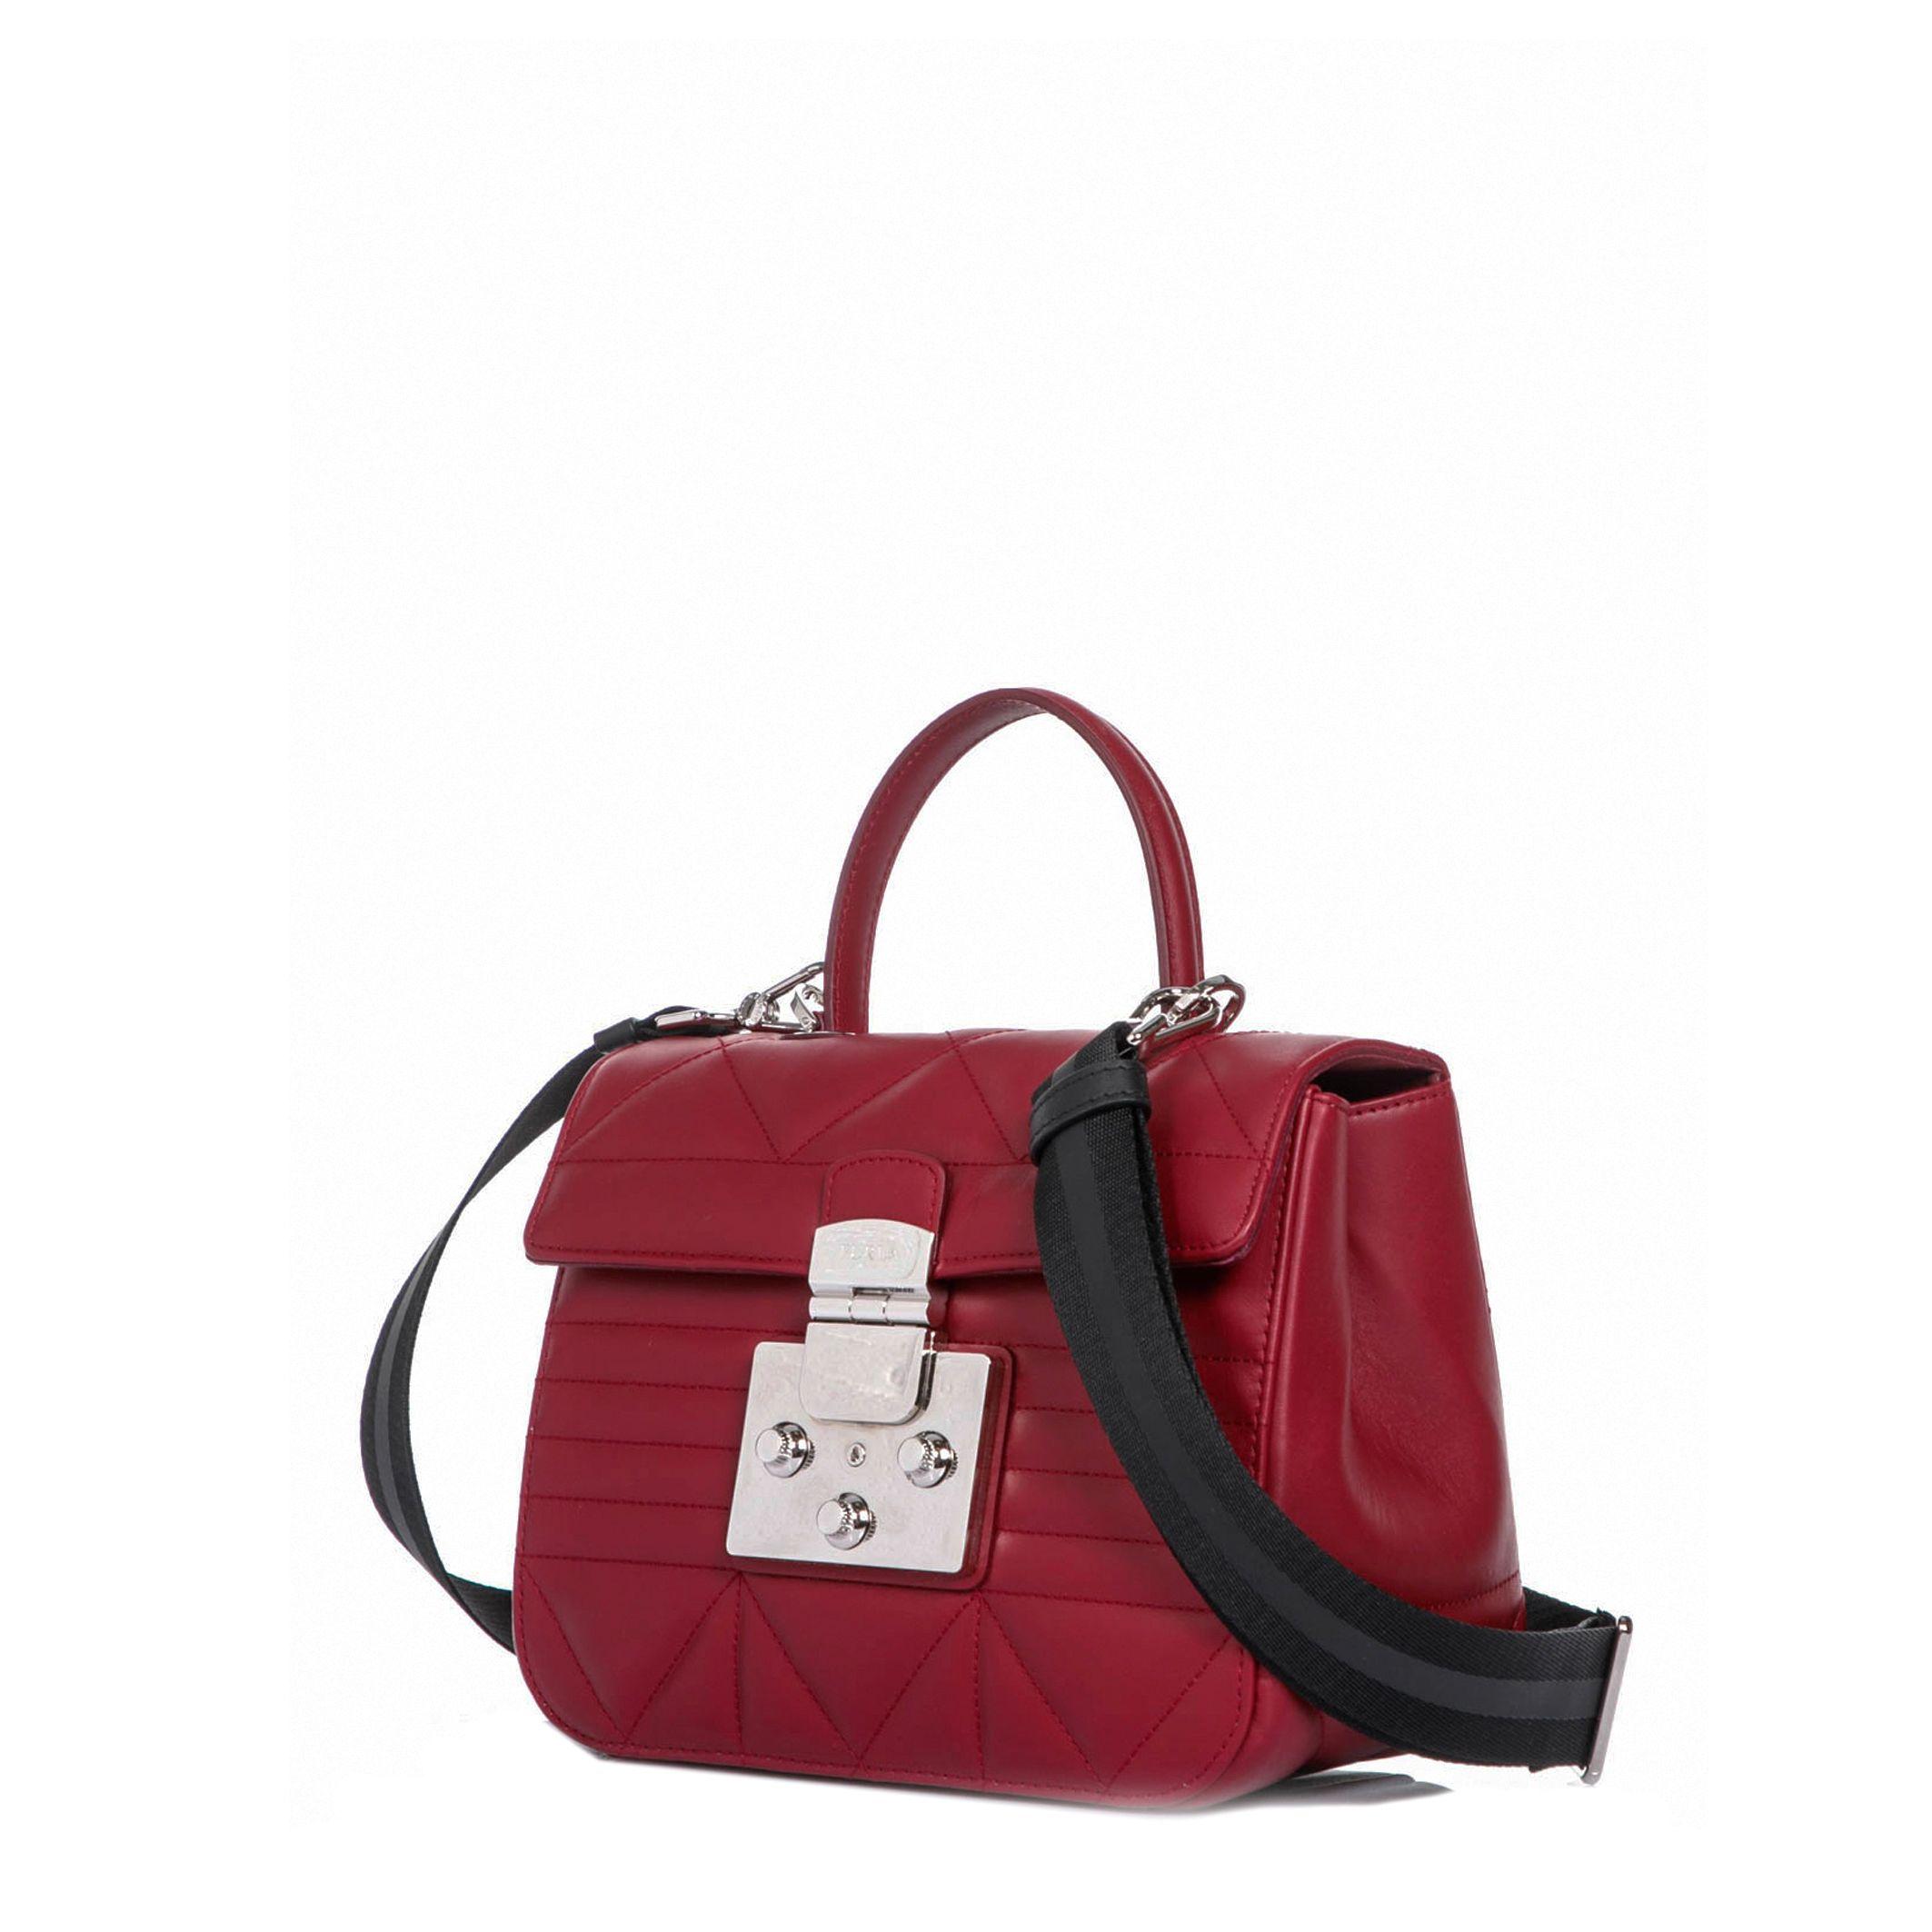 Furla - 988326 | You Fashion Outlet